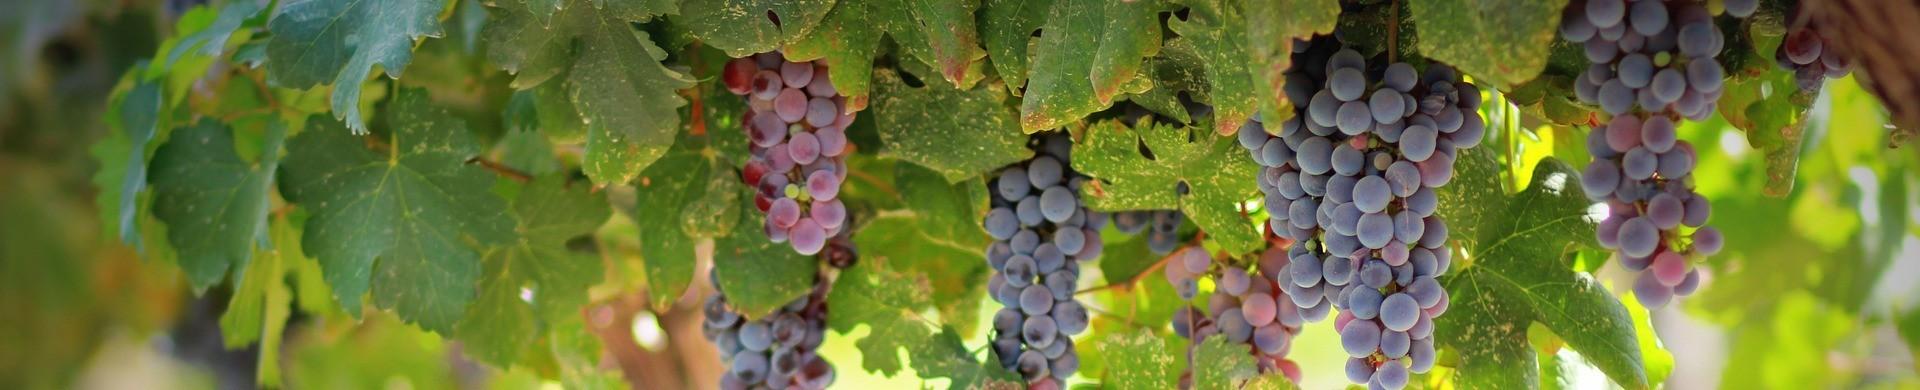 Parras de uva de mesa - Comprar plantas de uva